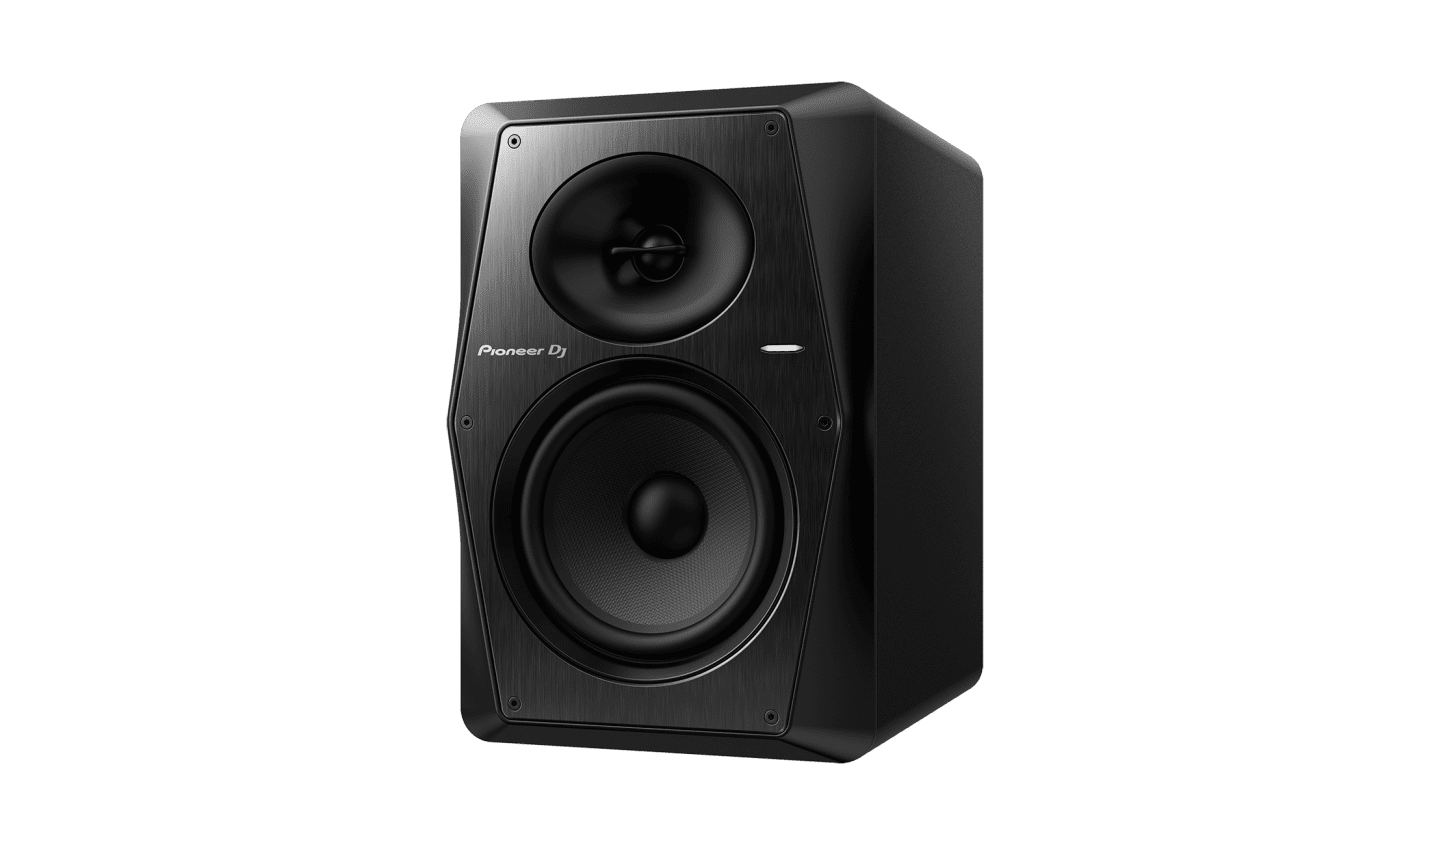 Test: Pioneer DJ VM-70 / aktive Nahfeld-Monitore